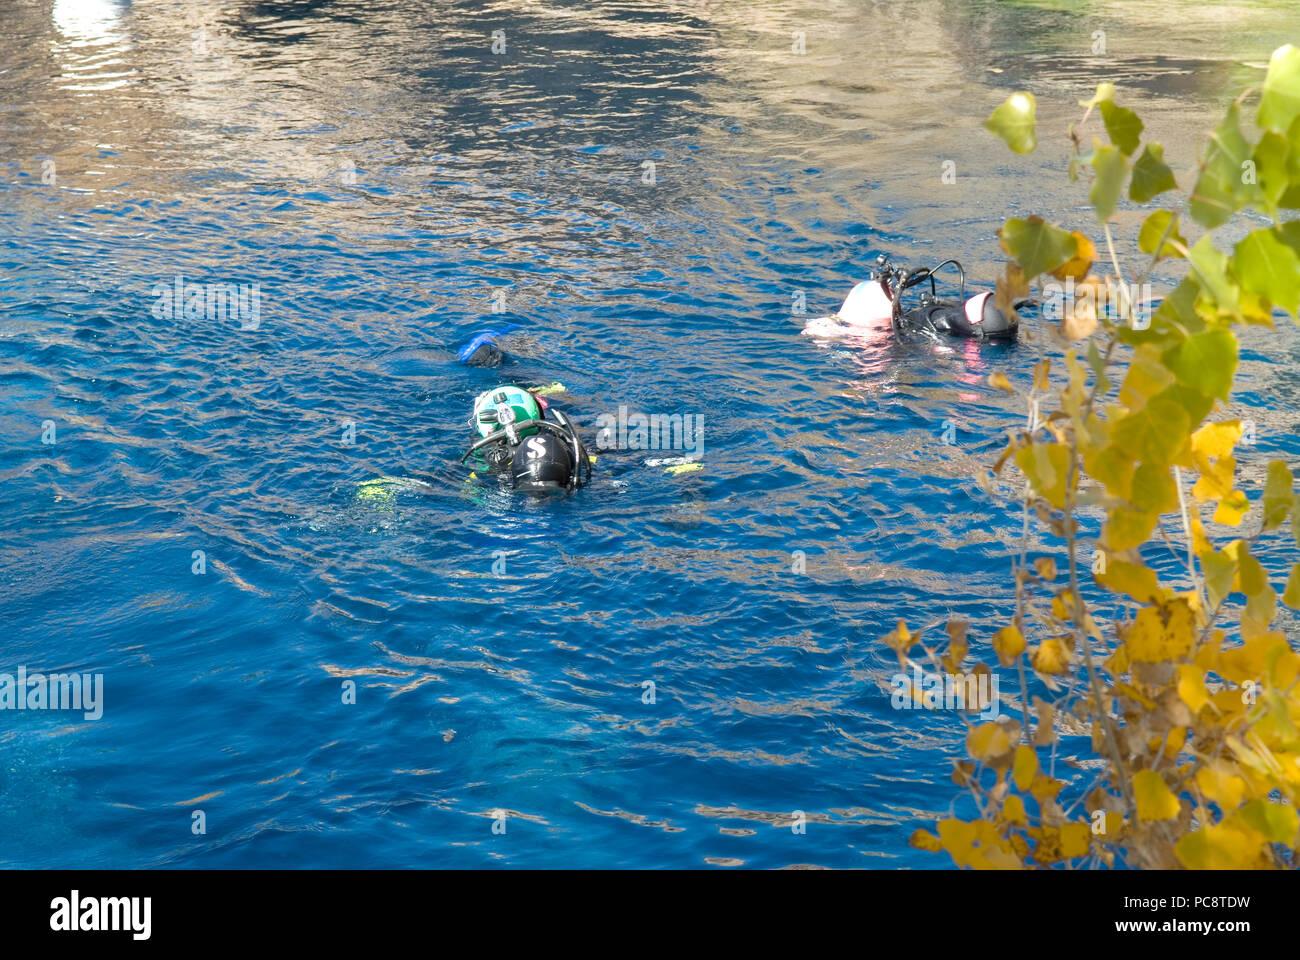 Scuba divers swim at Blue Hole, Santa Rosa New Mexico USA - Stock Image